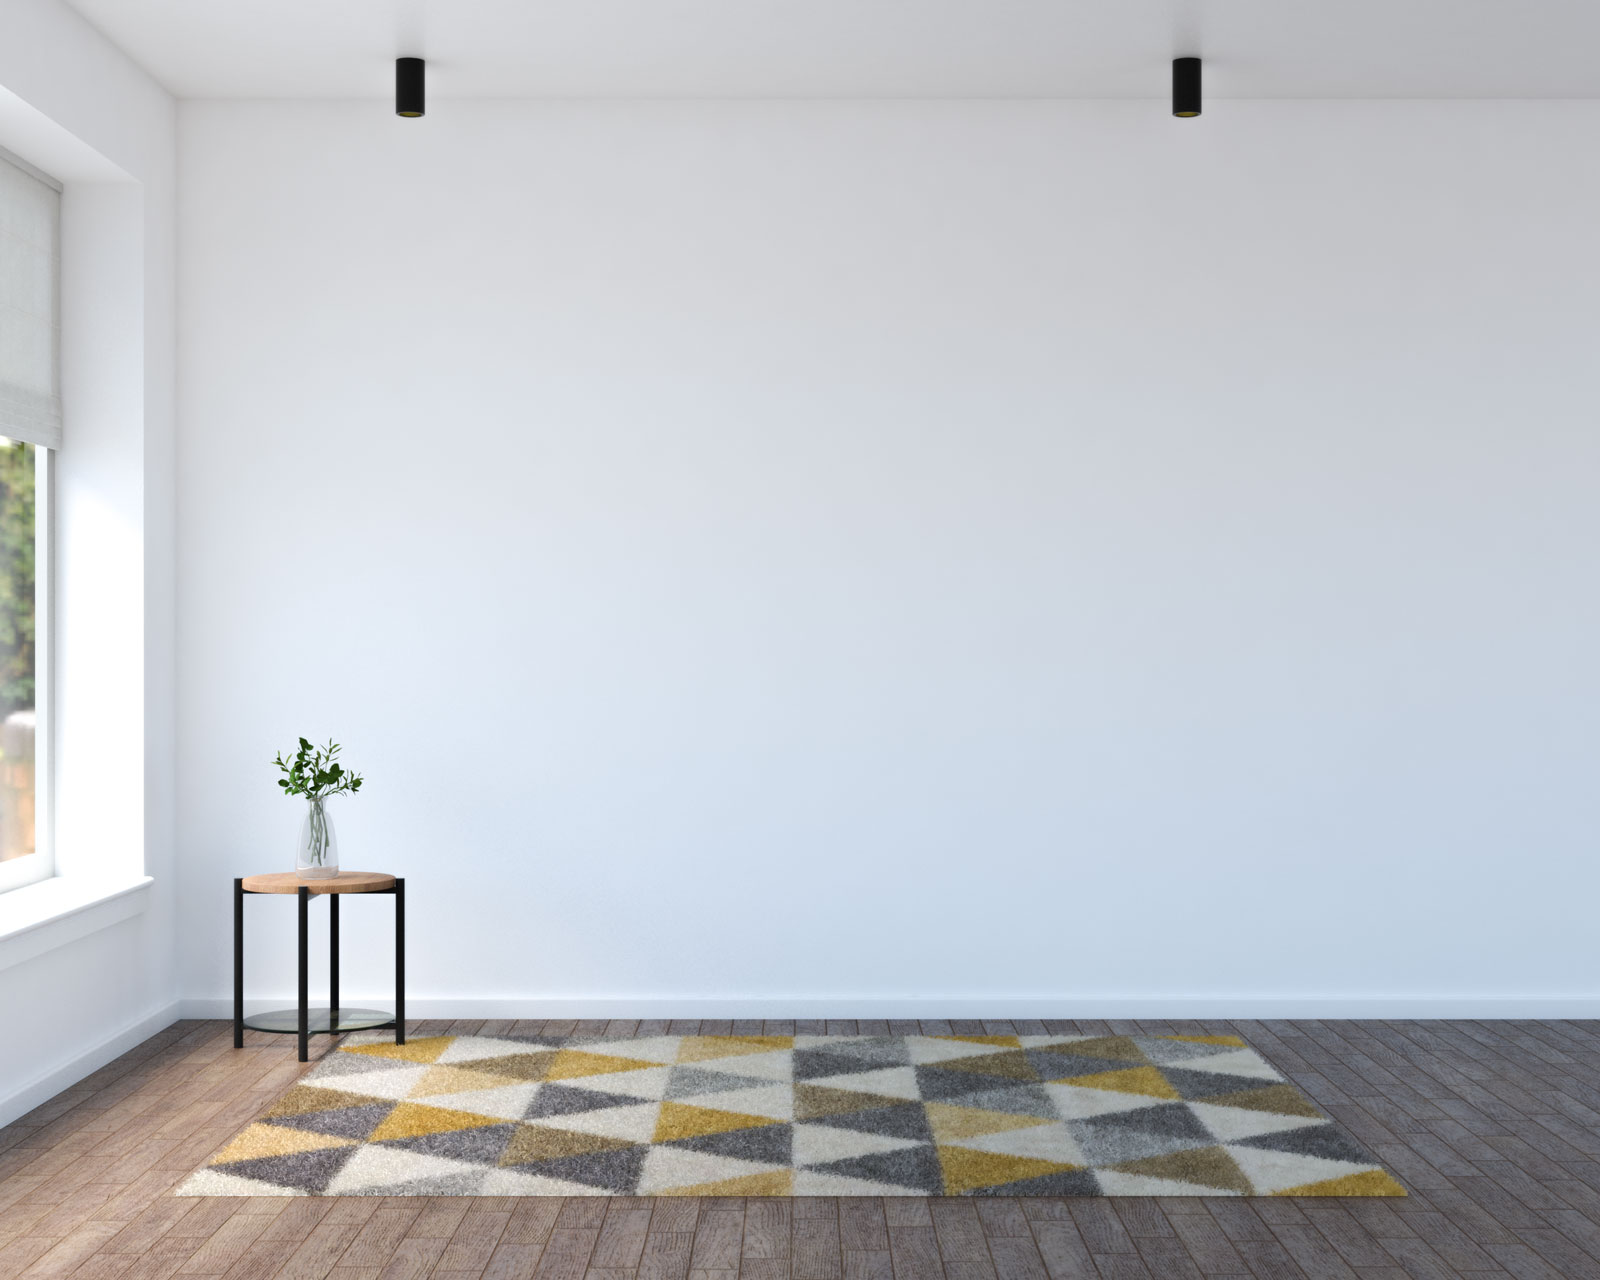 Yellow geometric area rug